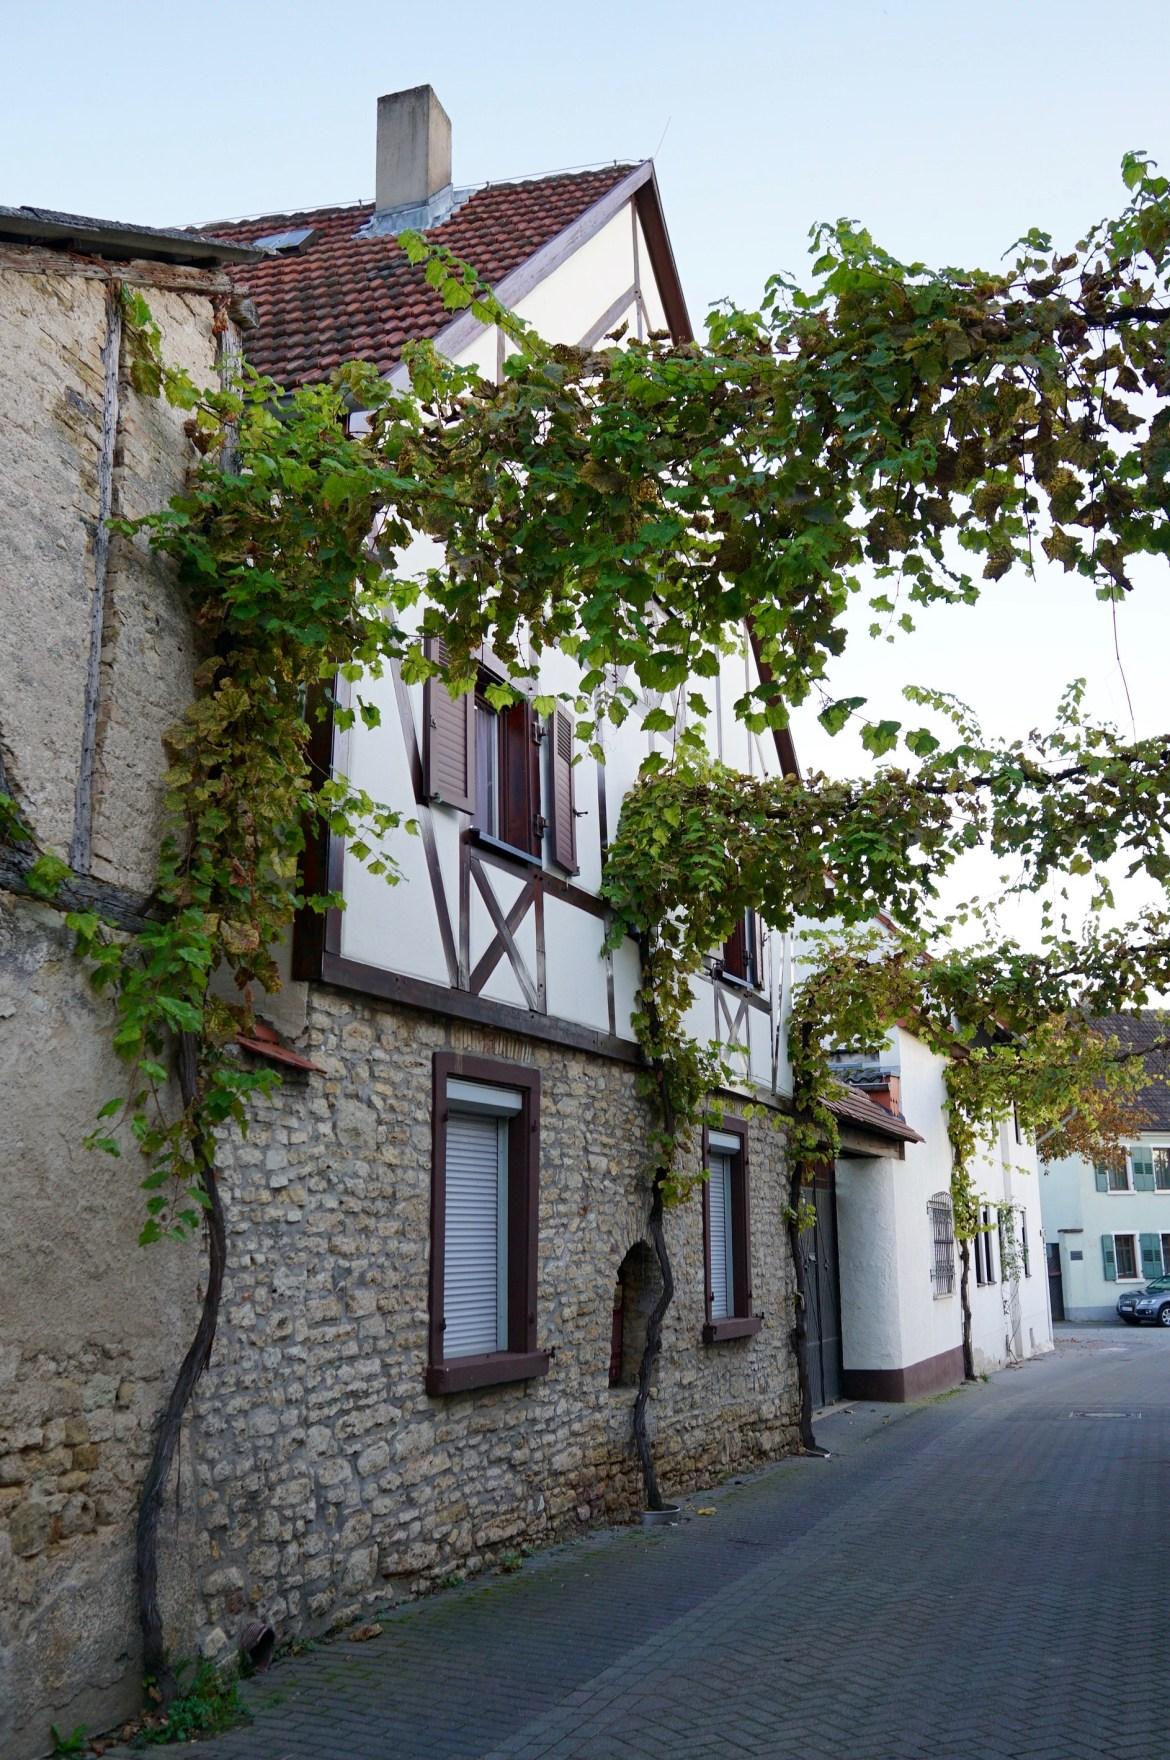 A street of half-timbered houses and hanging vines in Ingelheim-am-Rhein